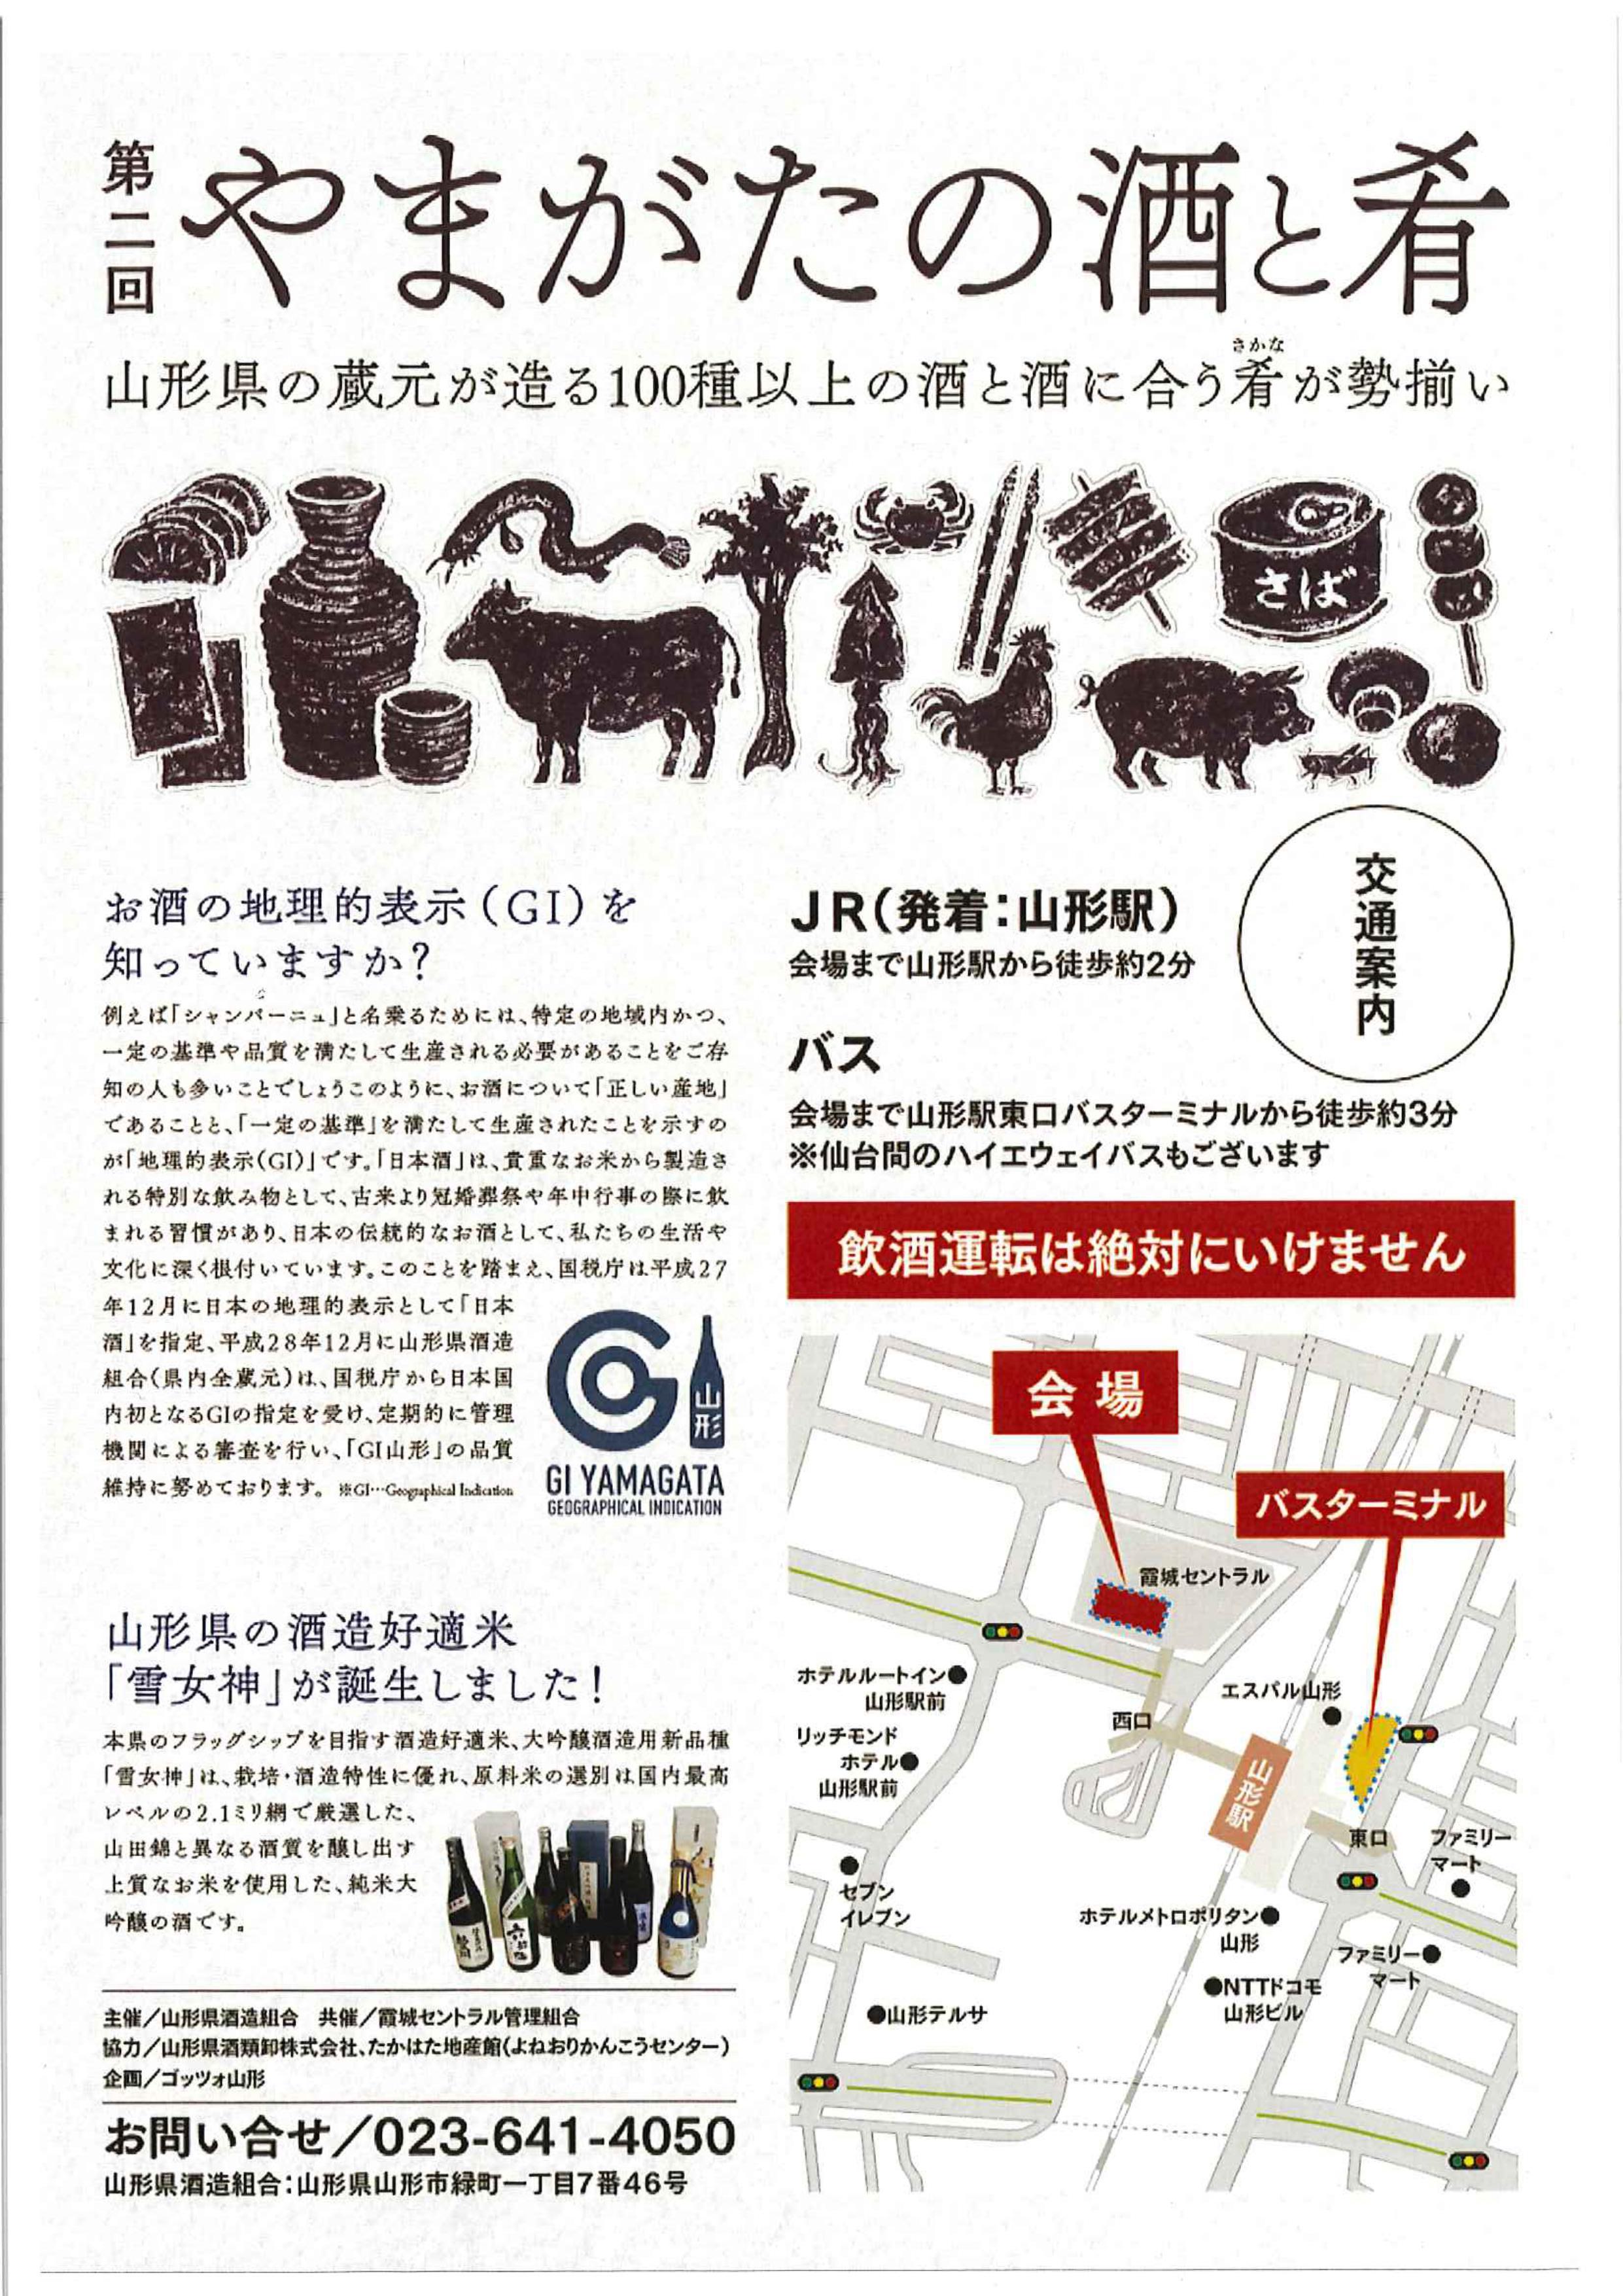 event-20171209-2.jpg